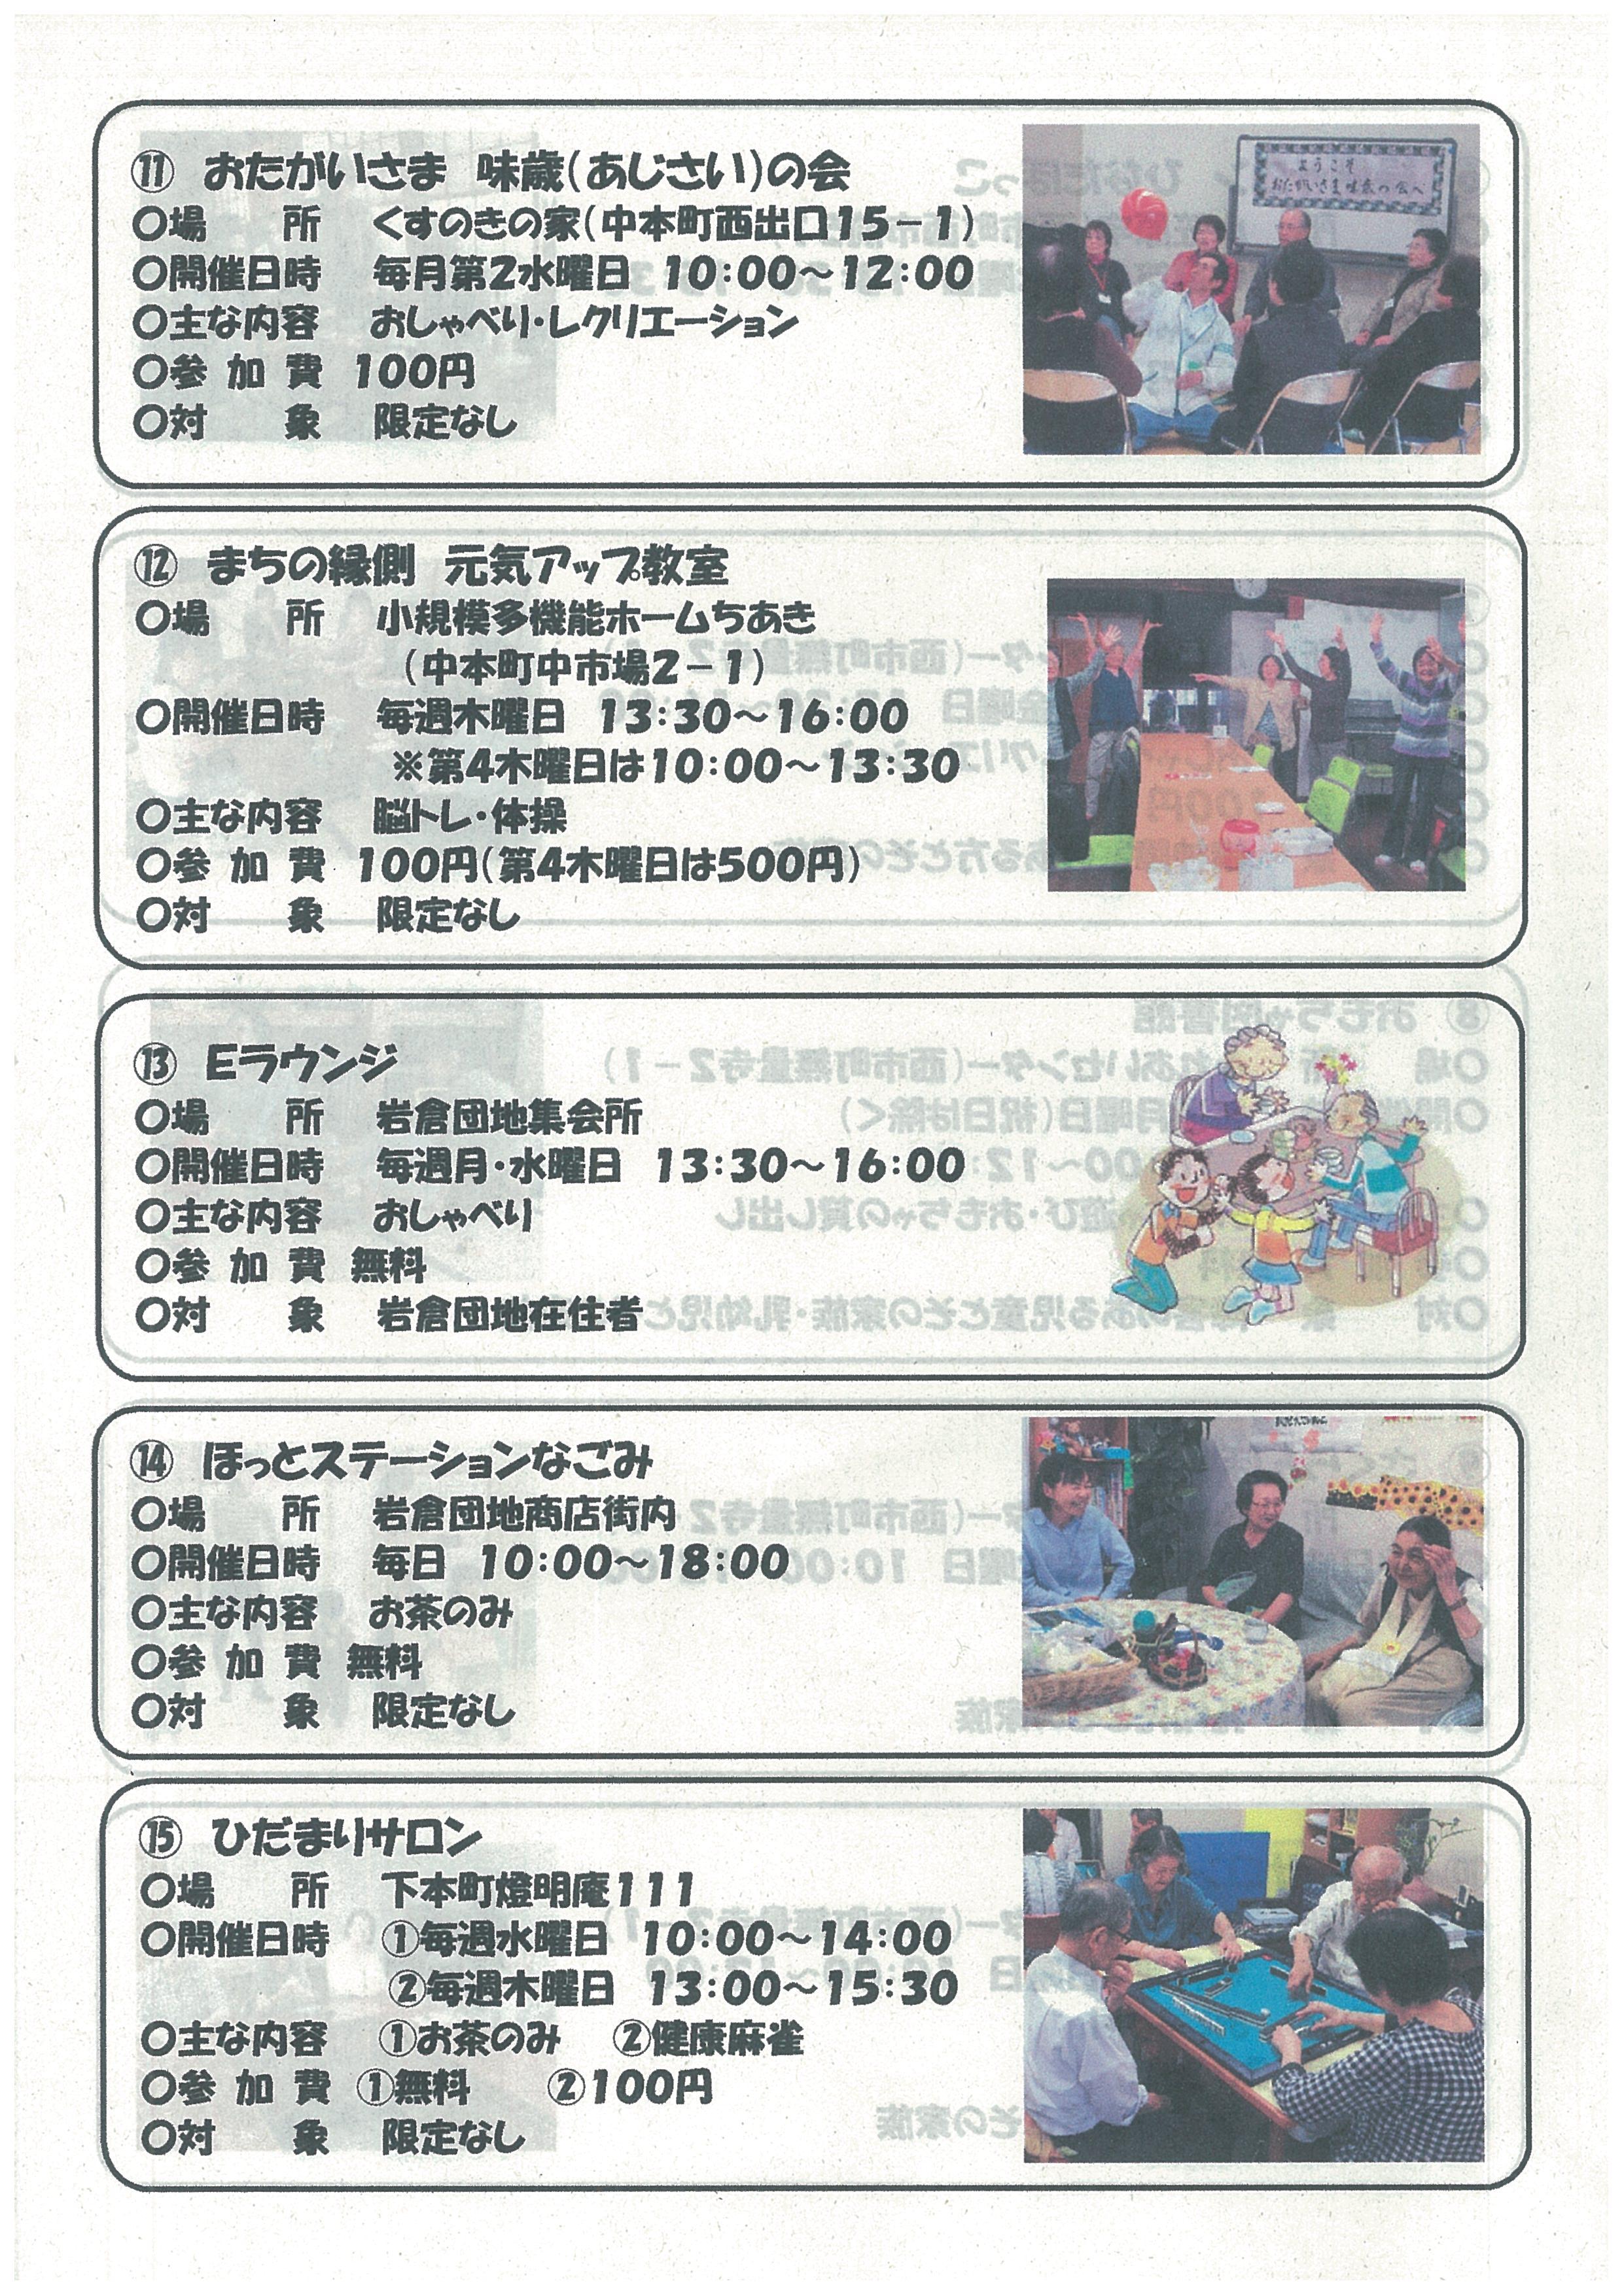 scan-001_20200925170224855.jpg